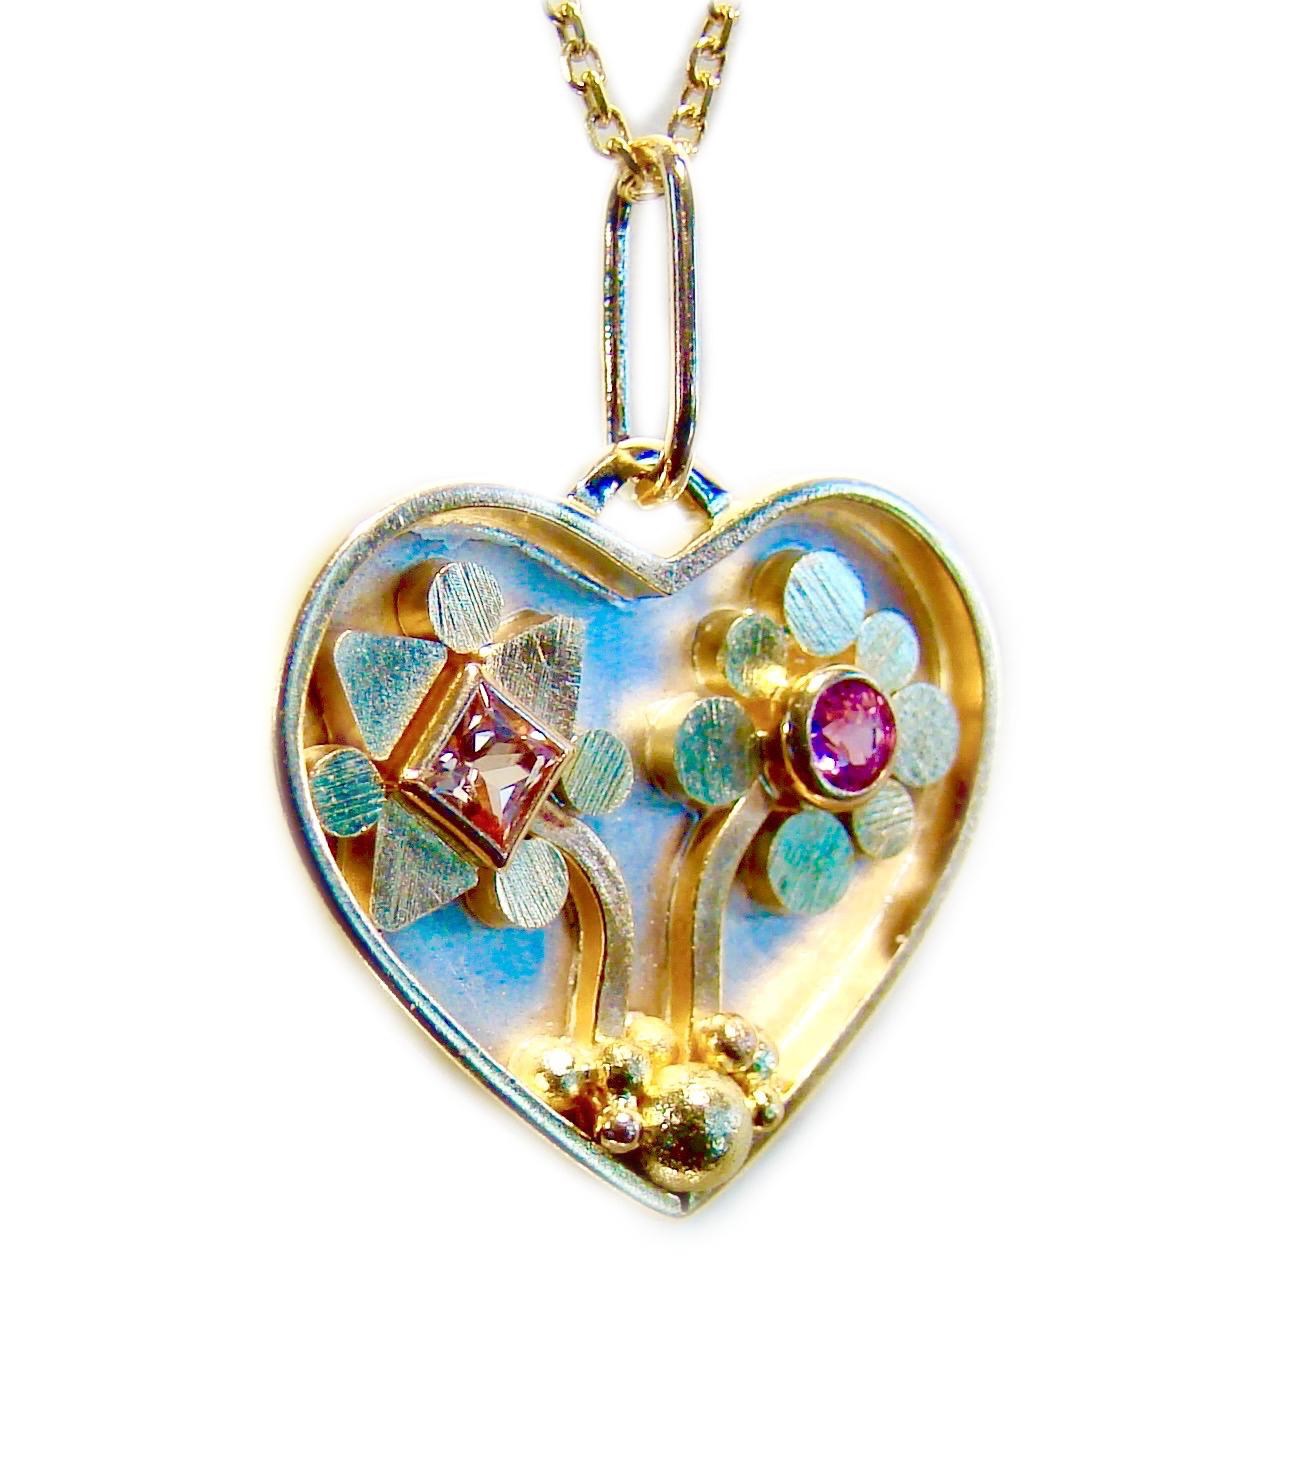 thumb_Gold Heart Pendant Sapphires #718-1_1024.jpg